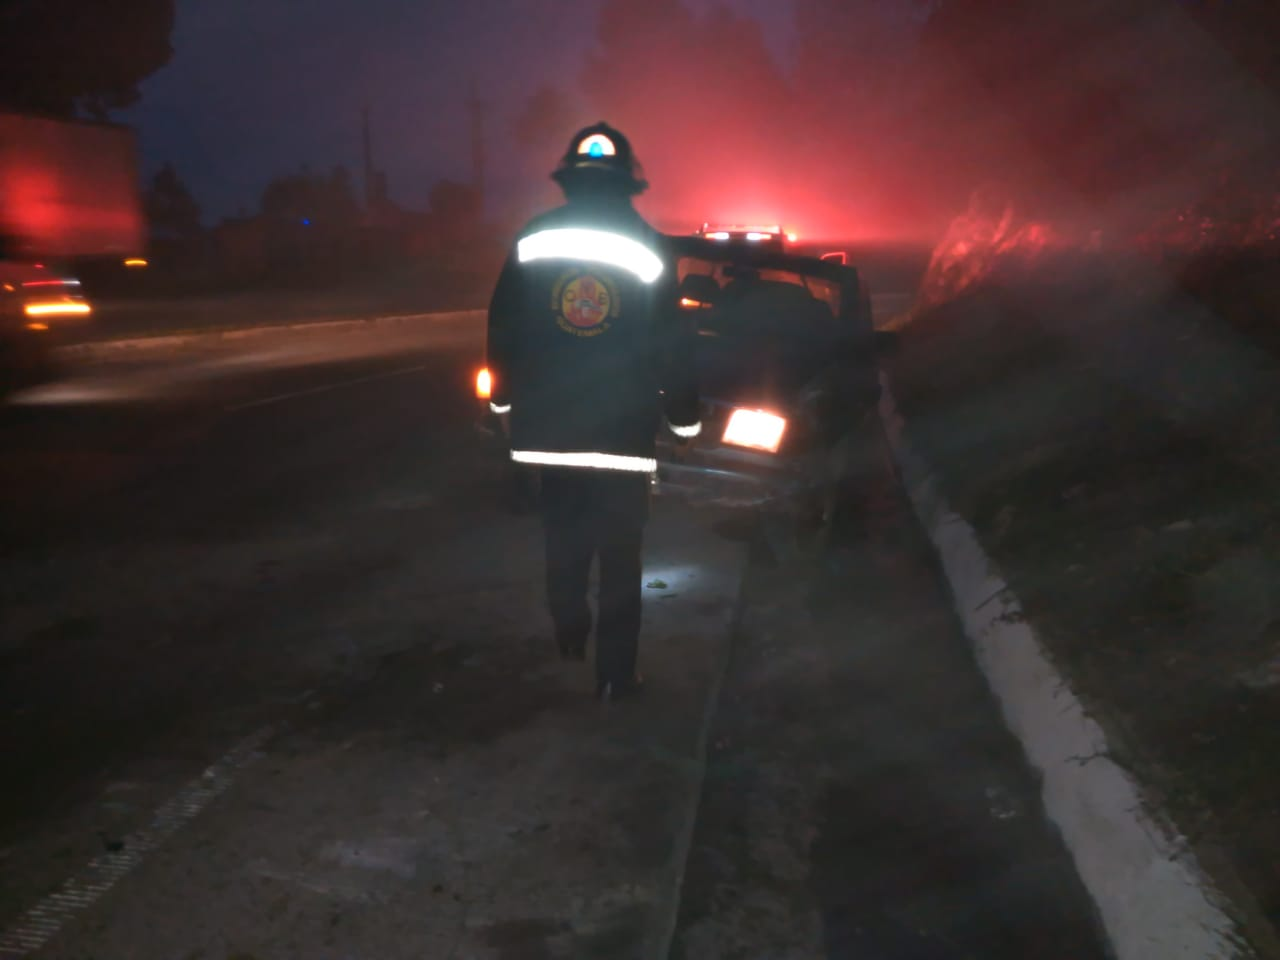 Volcó tras colisionar contra paredón en la ruta CA-1